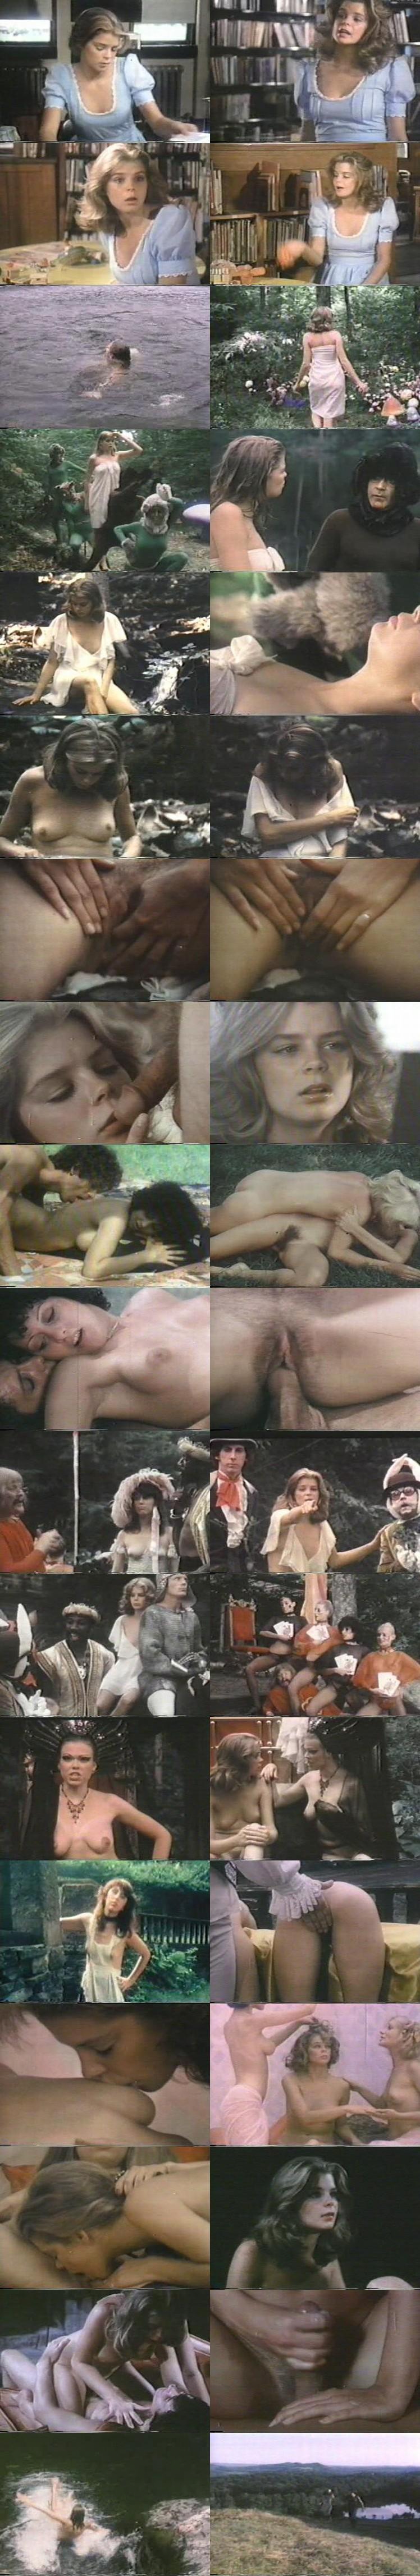 Alice in wonderland 1976 full